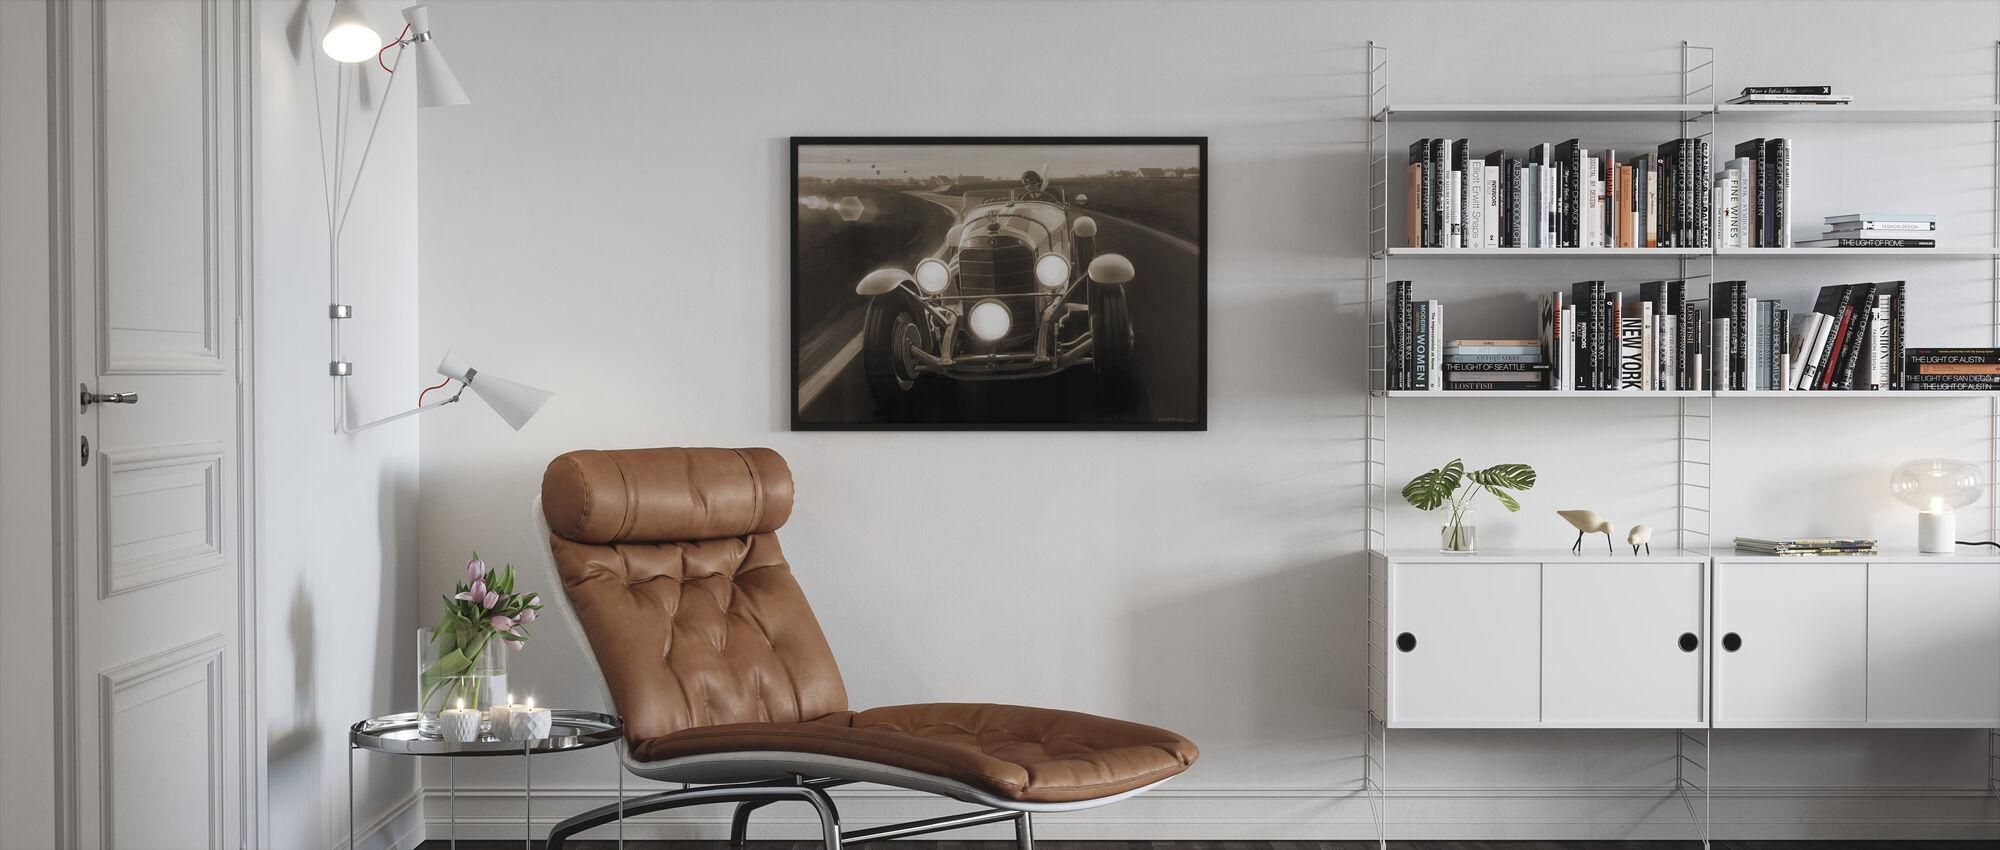 SSK Sepia - Framed print - Living Room